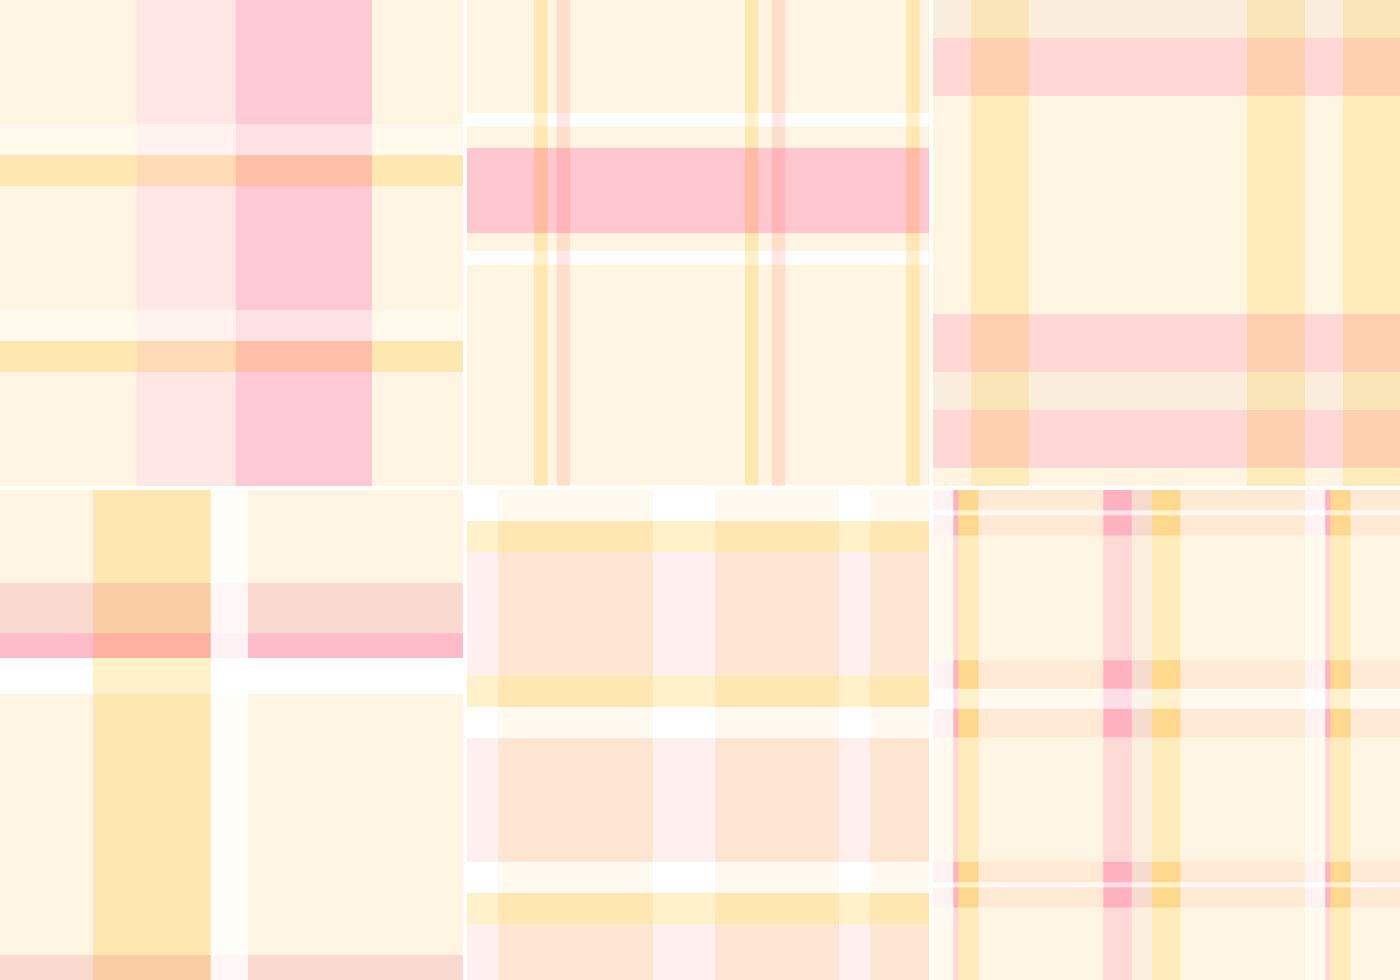 plaid pastel pattern pack free photoshop brushes at brusheezy. Black Bedroom Furniture Sets. Home Design Ideas